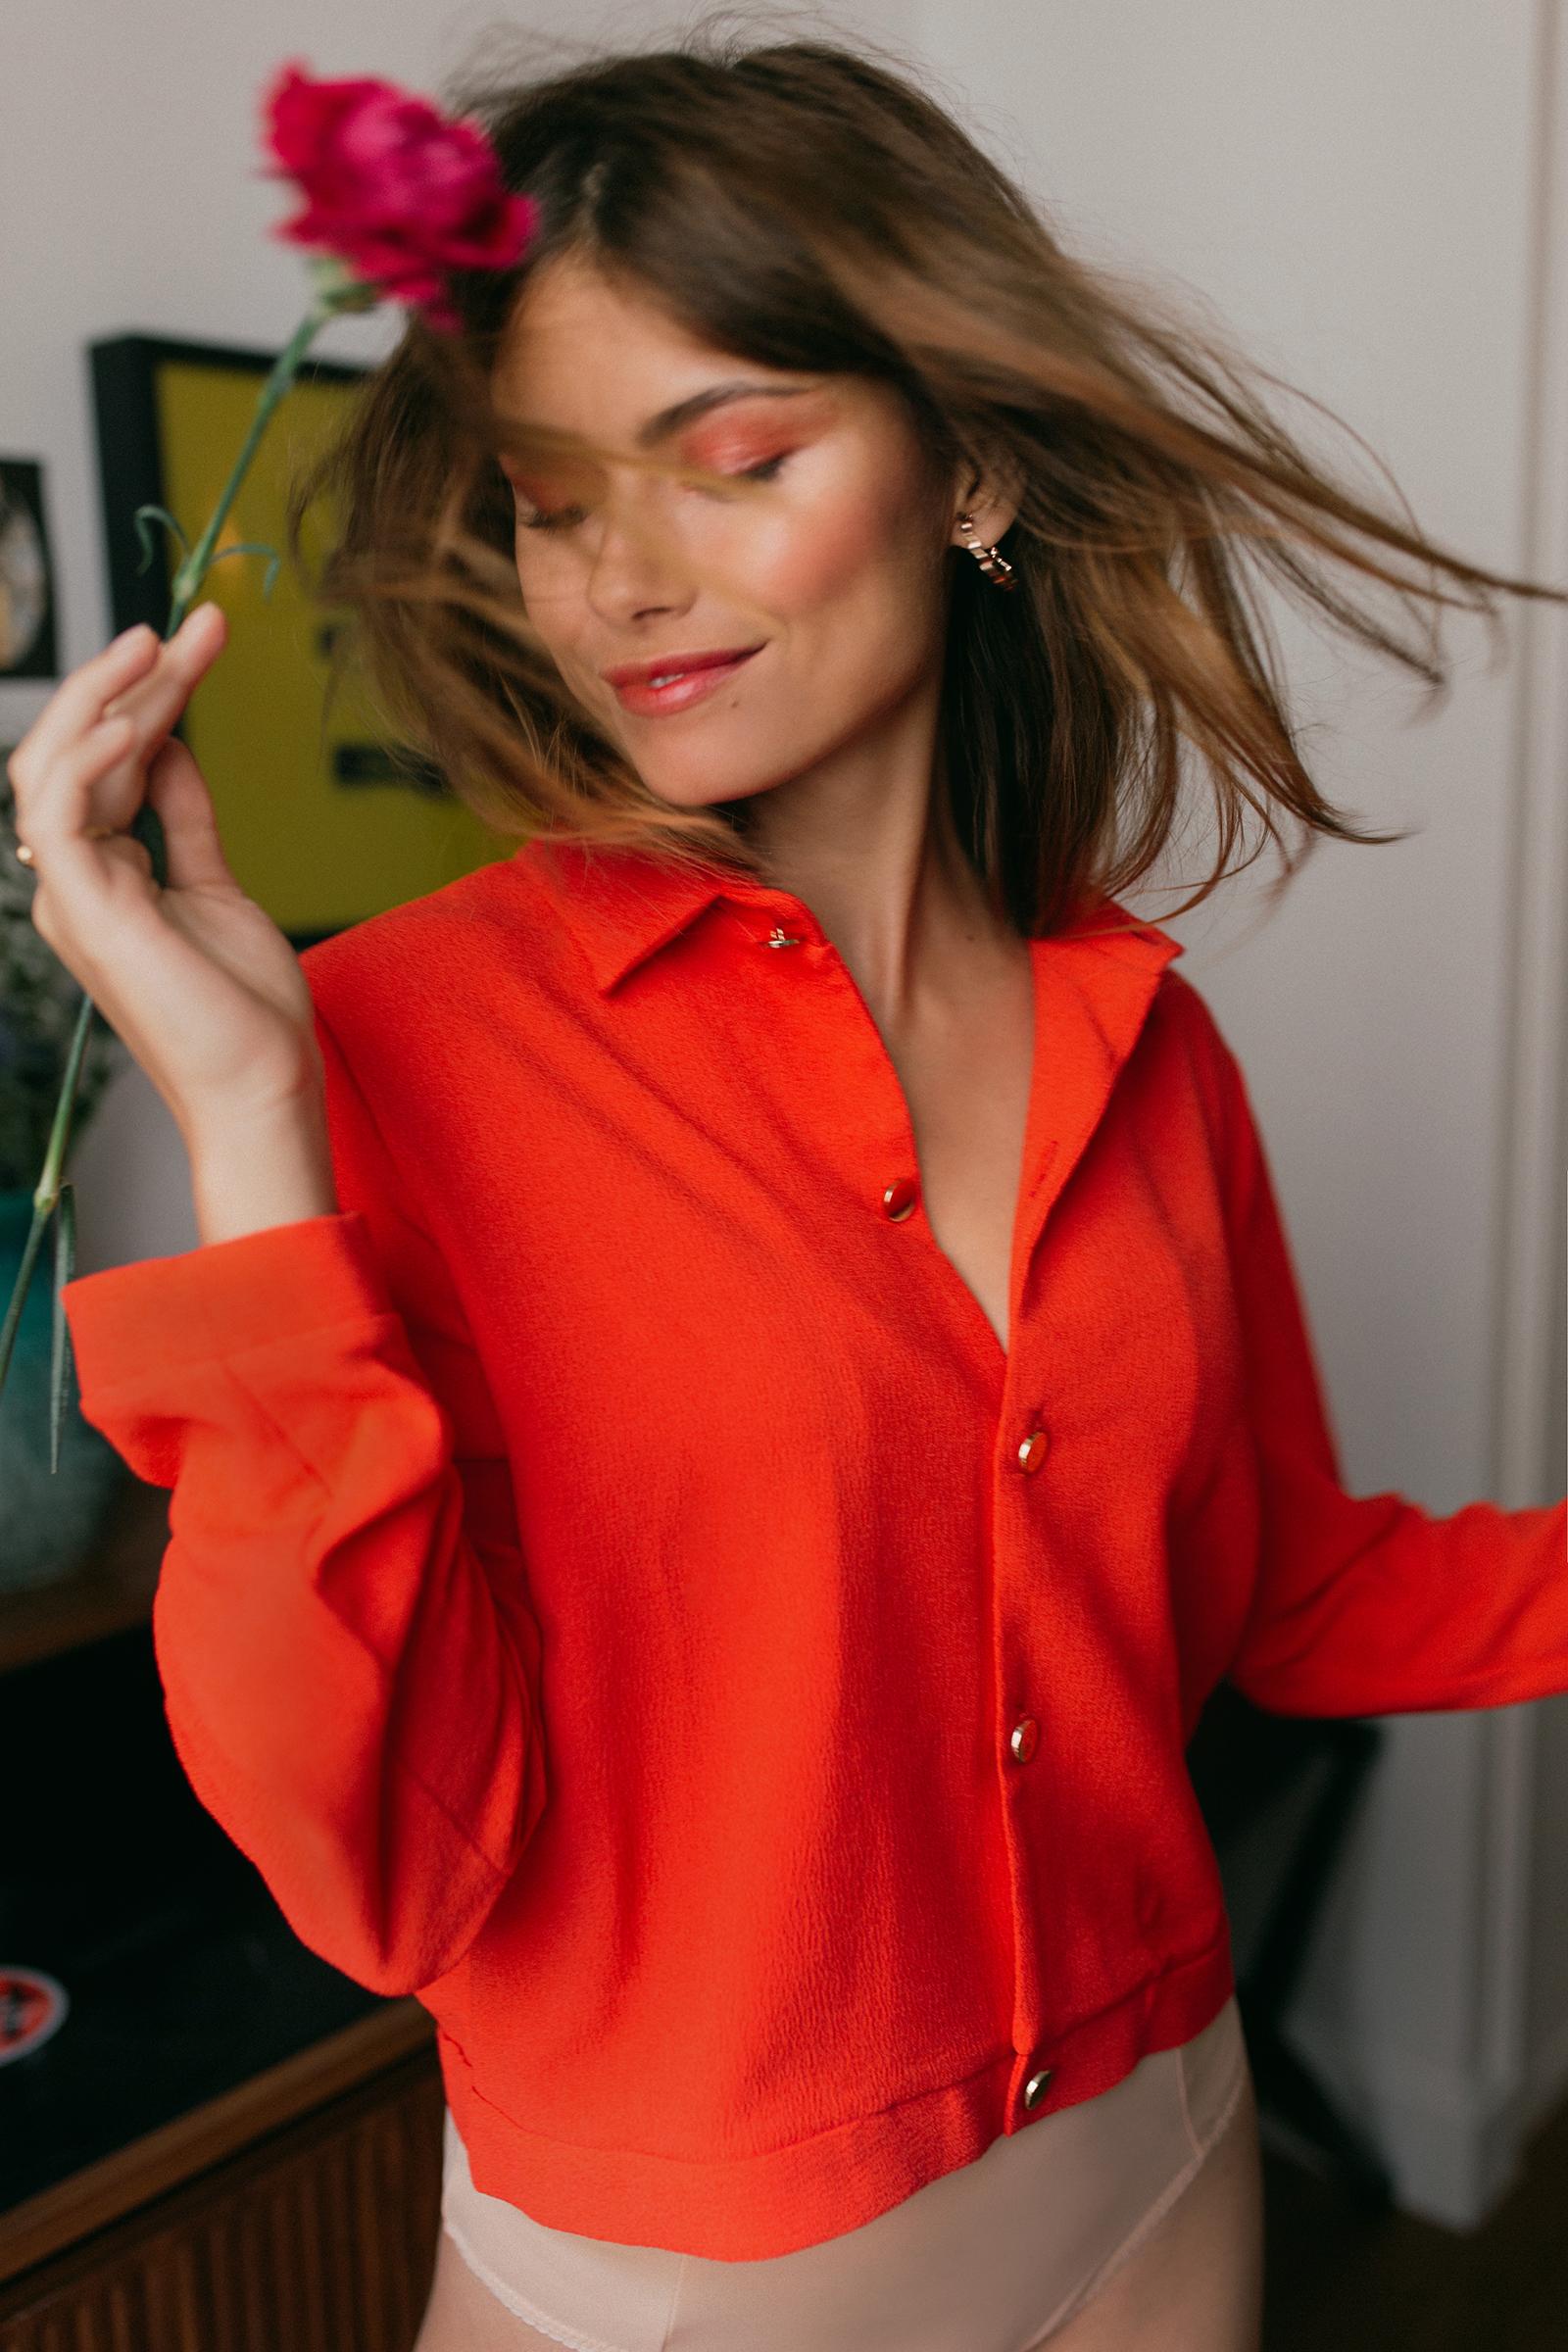 editorial_Yasmine-Ravel_anne-charlotte-moreau_02